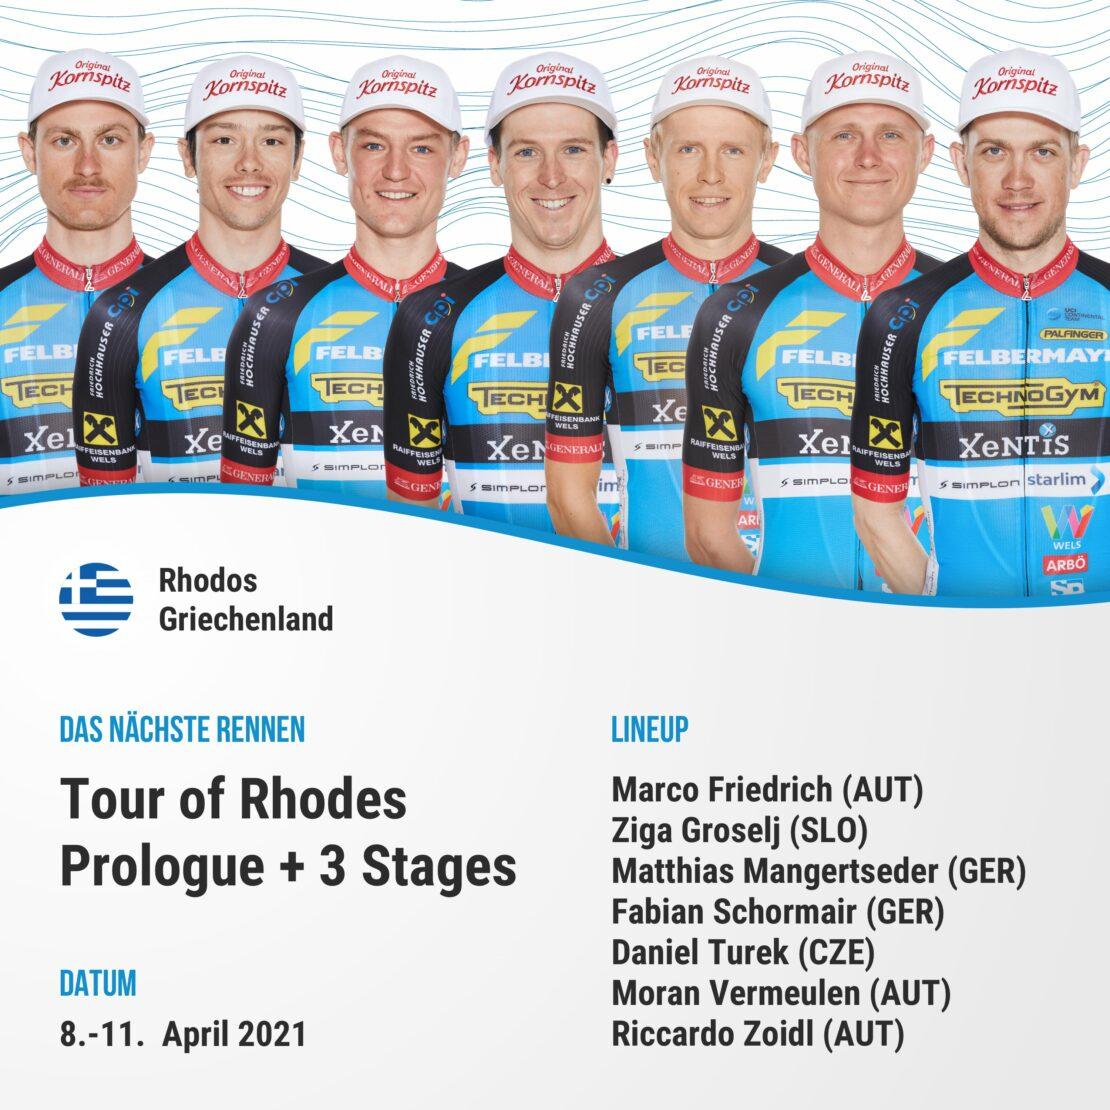 Tour of Rhodes